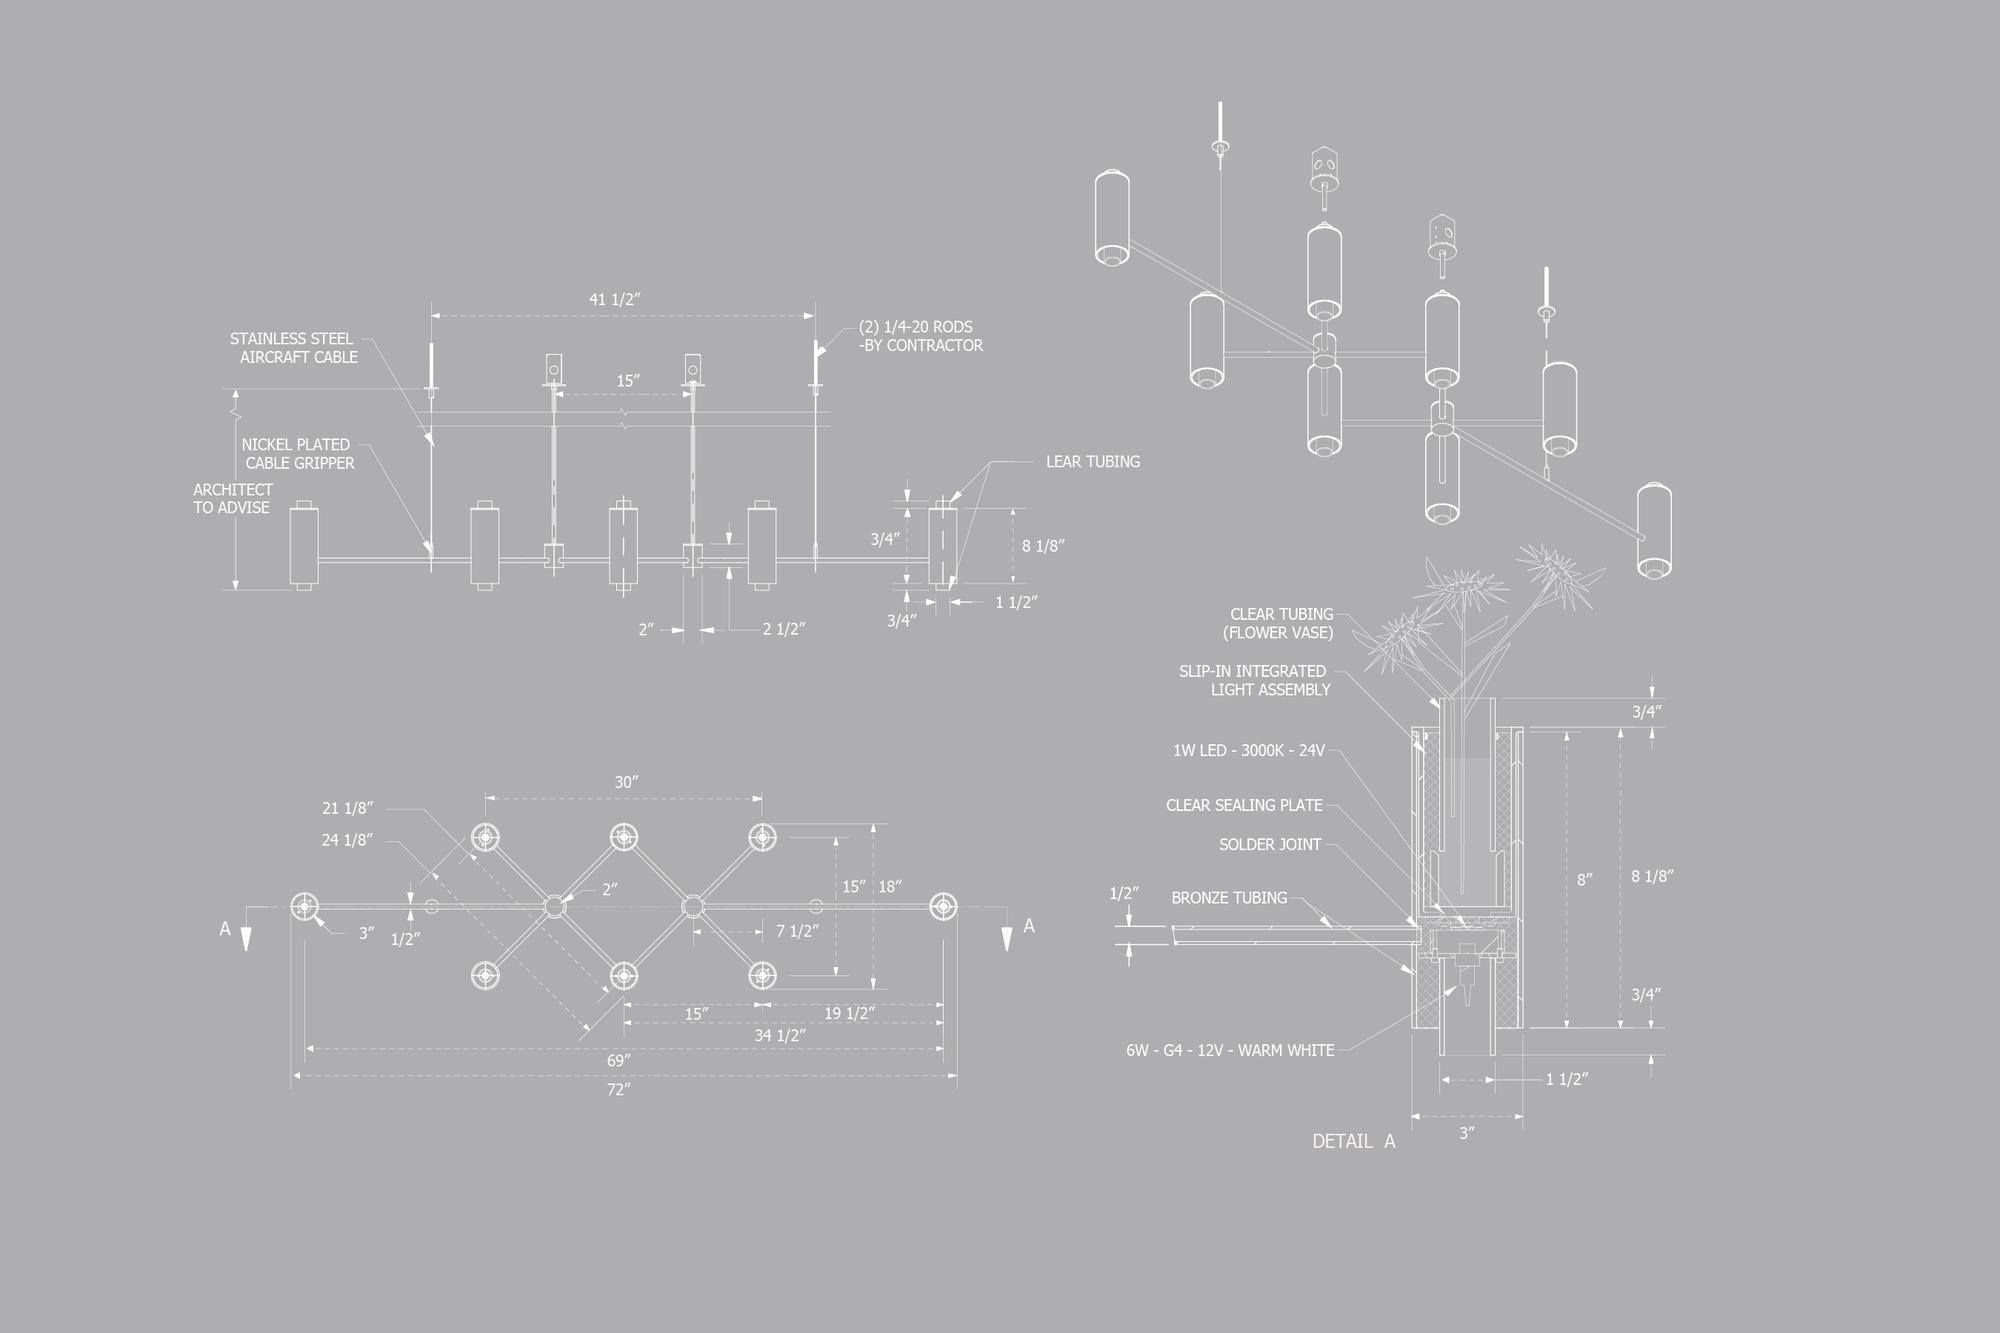 CHANDELIER-FOR-WEBSITE-01 strategic design consultancy